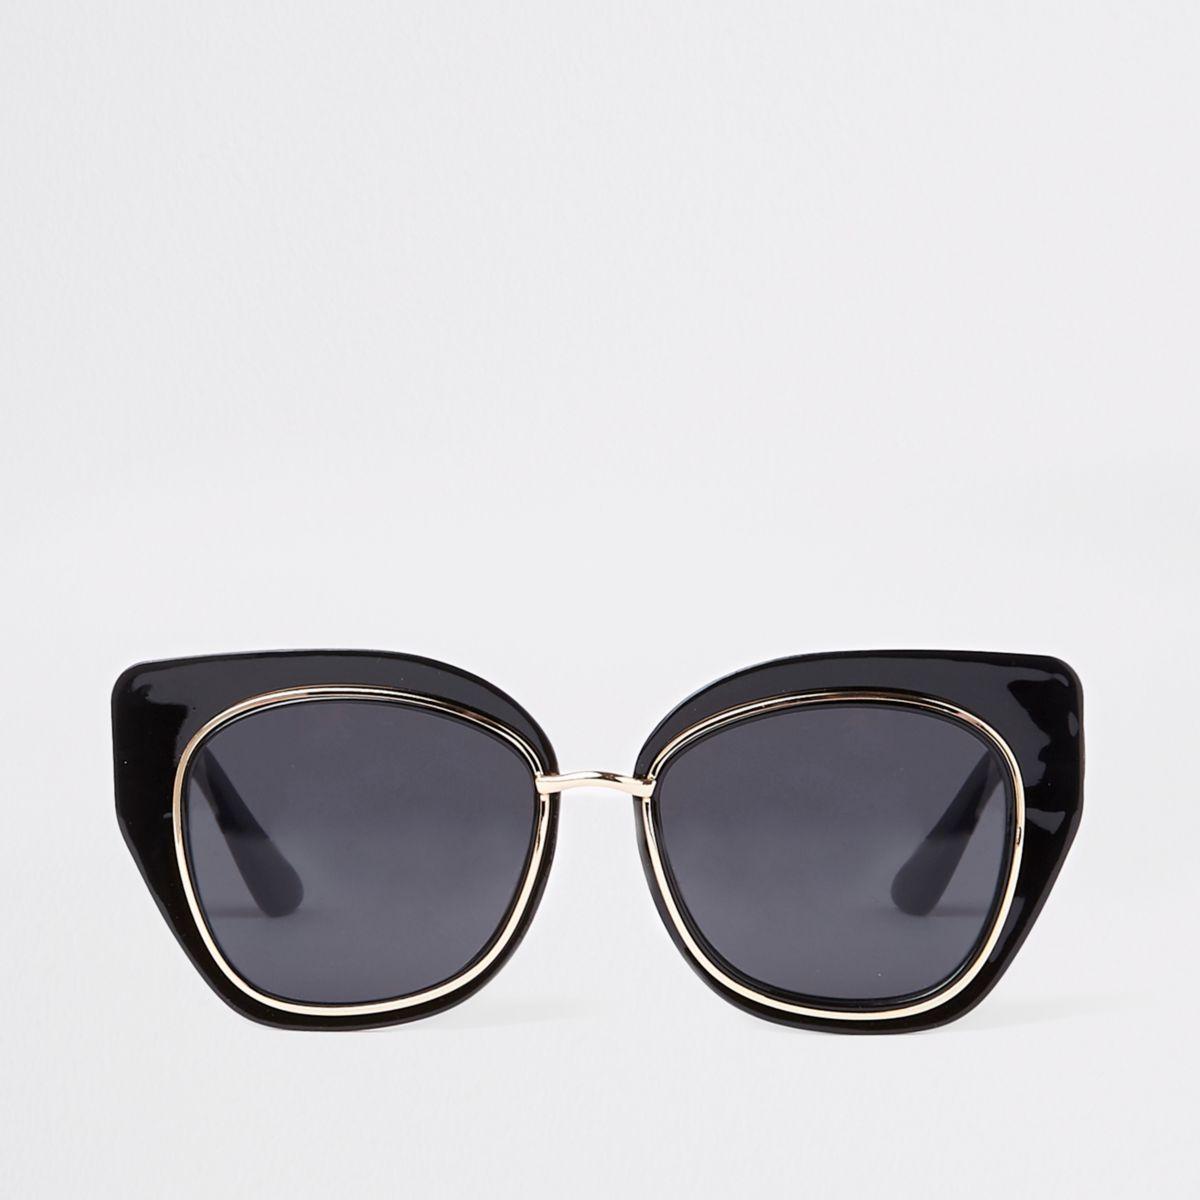 Black plastic glam aviator sunglasses